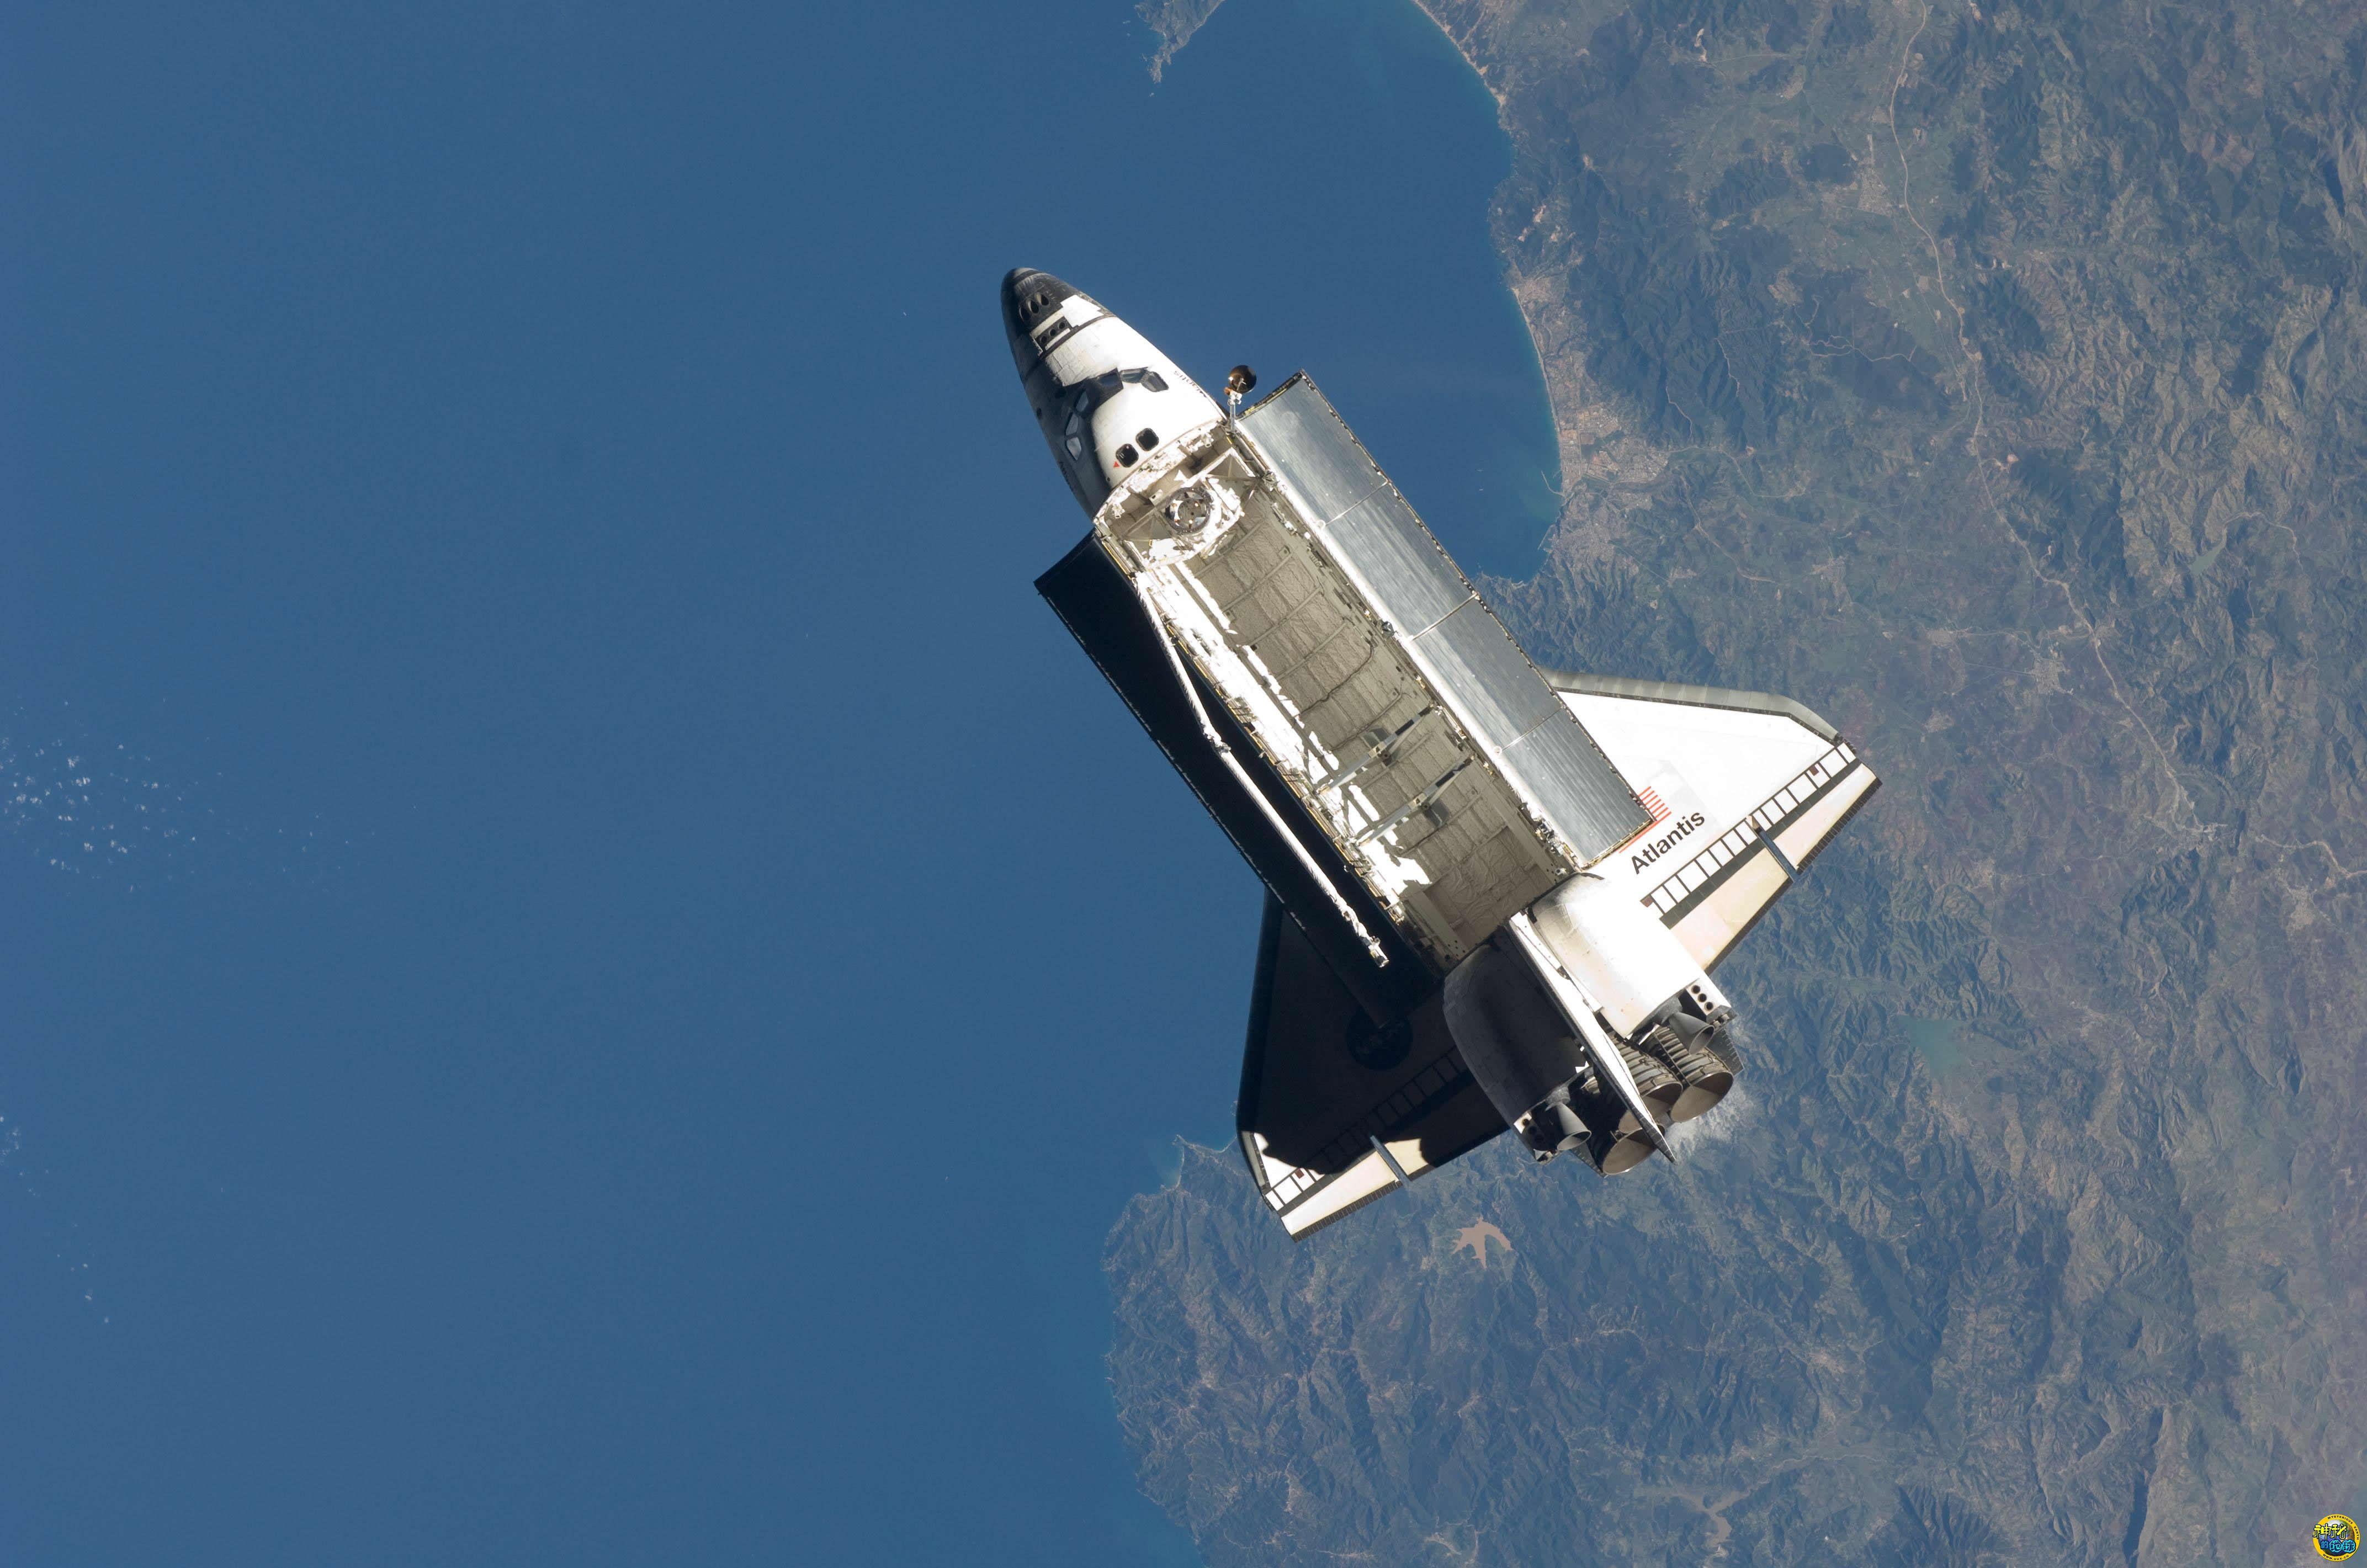 space shuttle habitable volume - photo #20